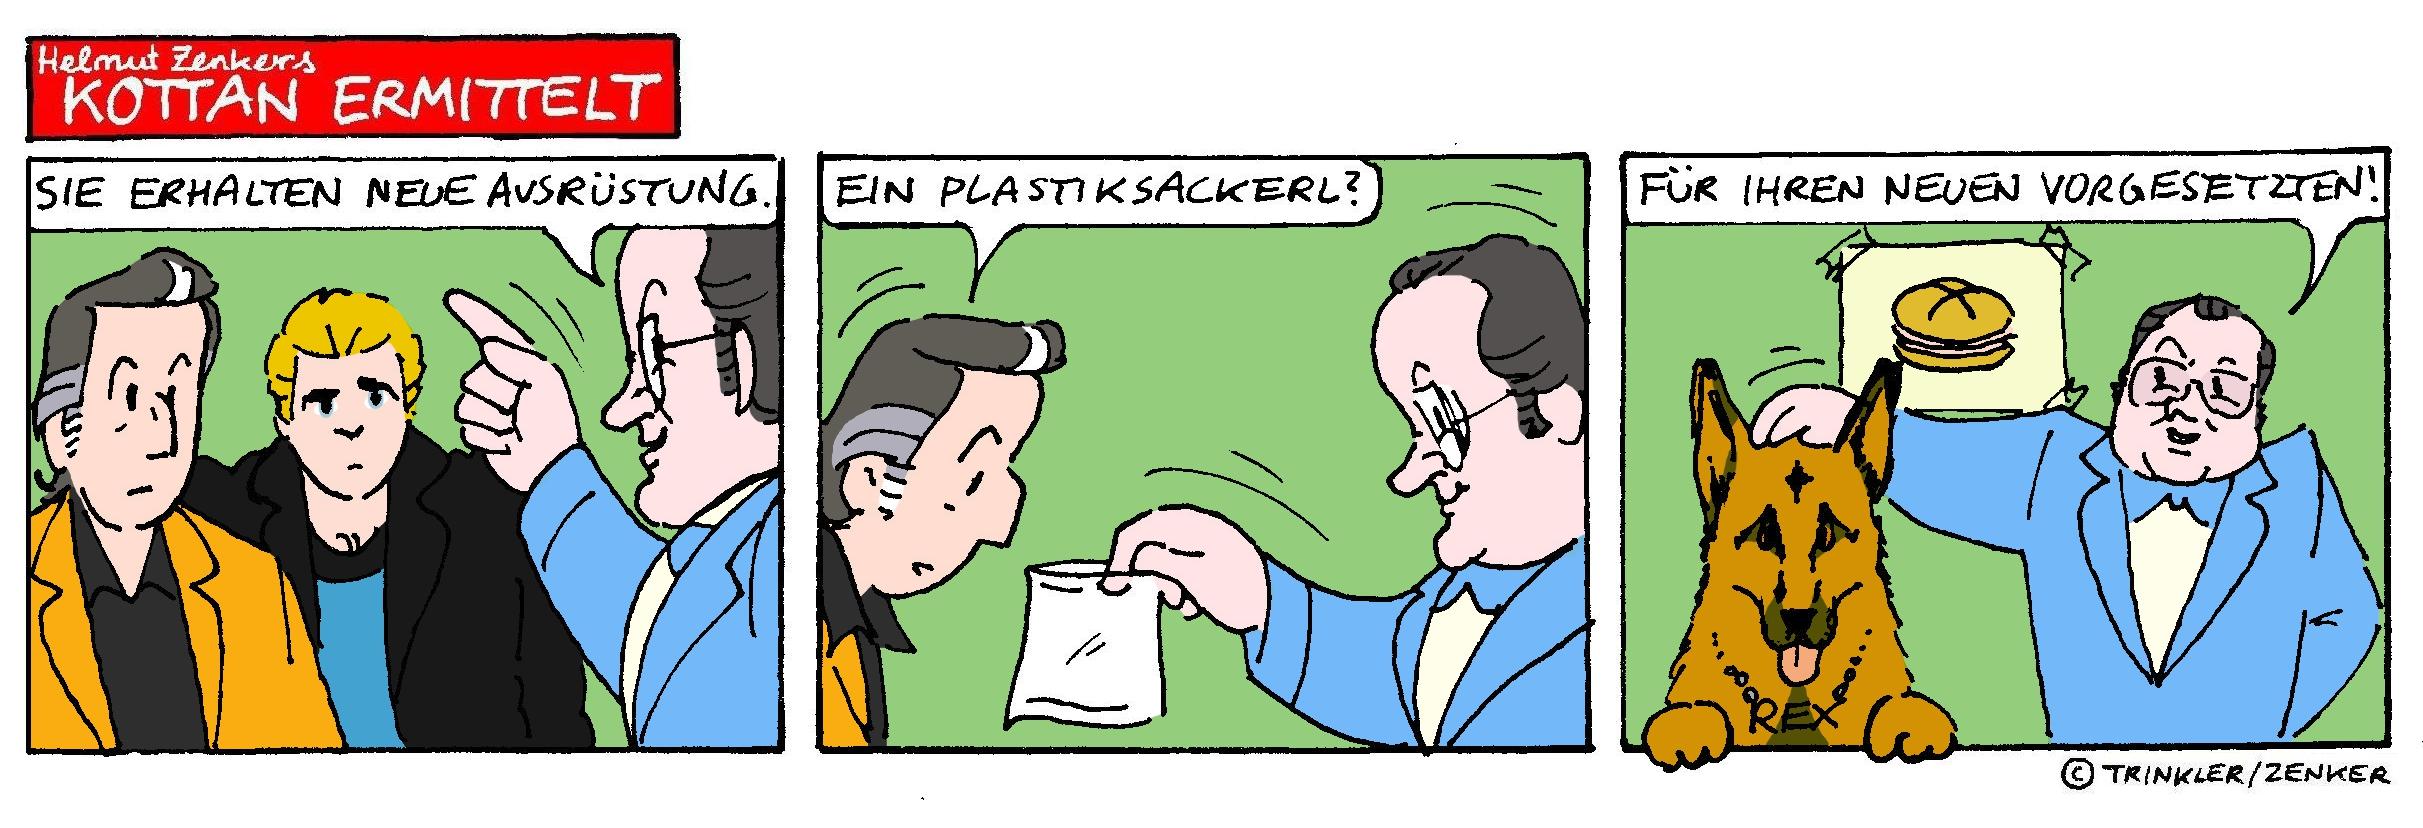 Kottan ermittelt - Comicstrip Nr. 21